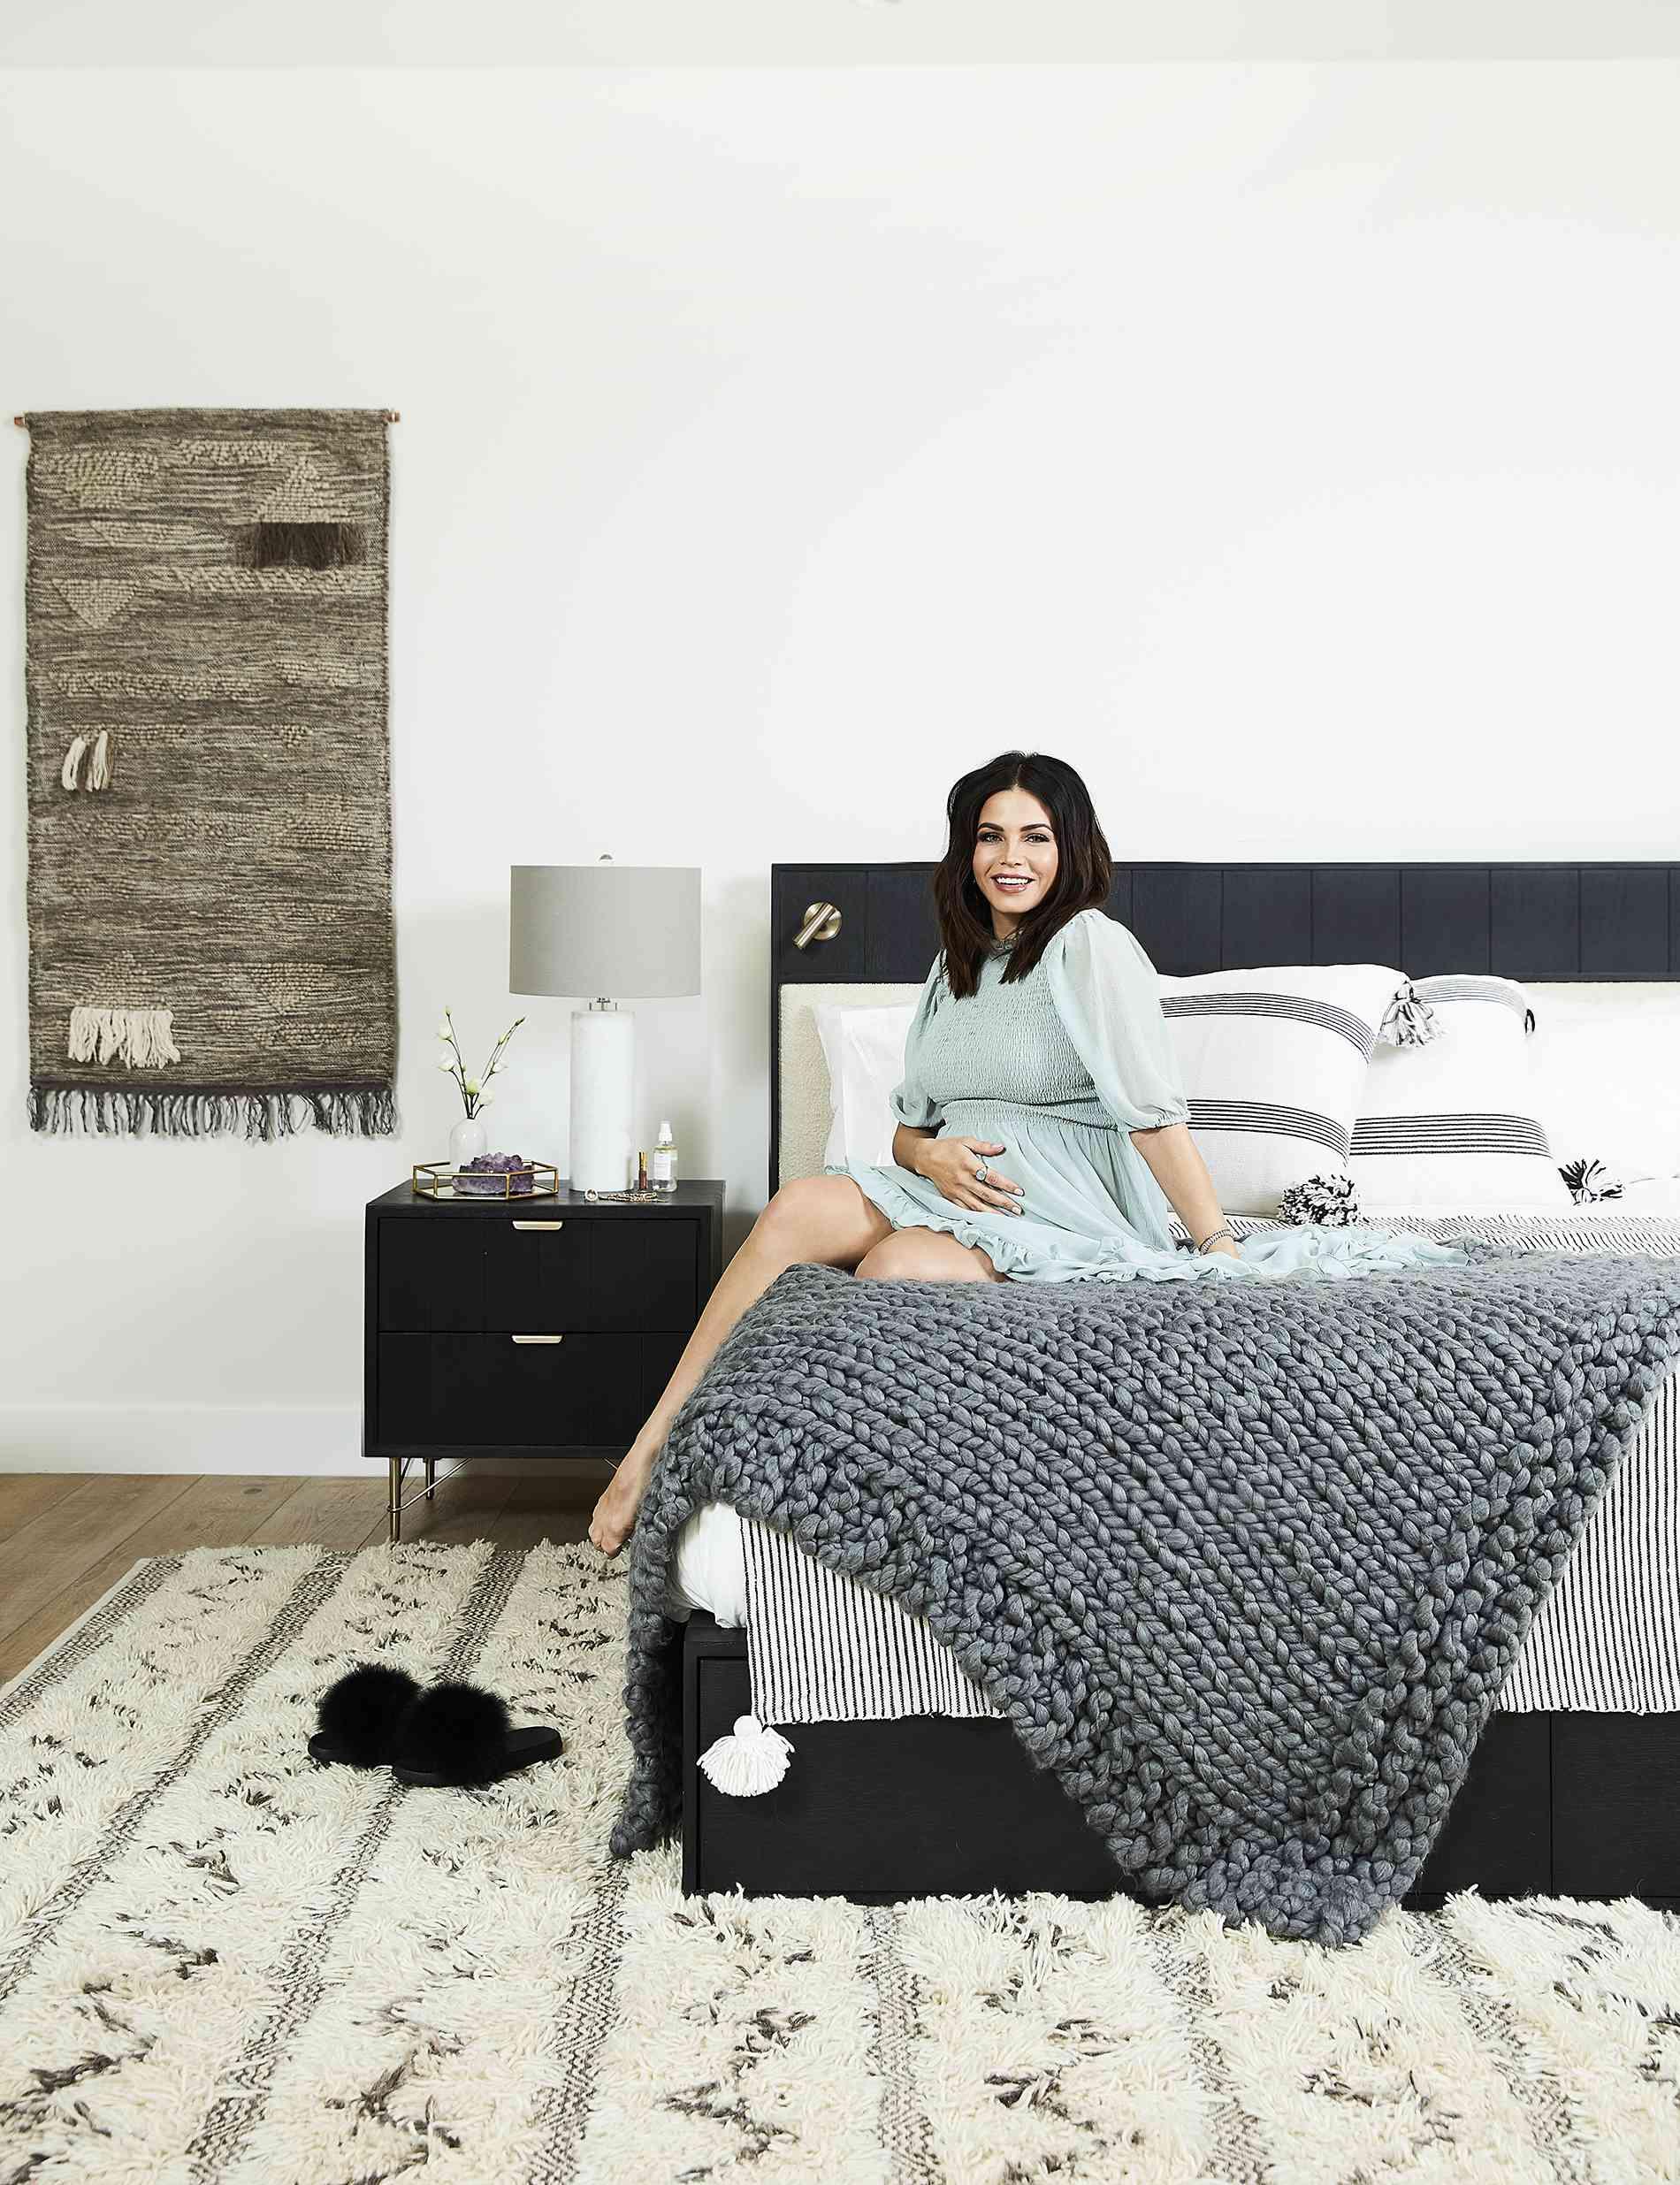 jenna dewan in her master bedroom